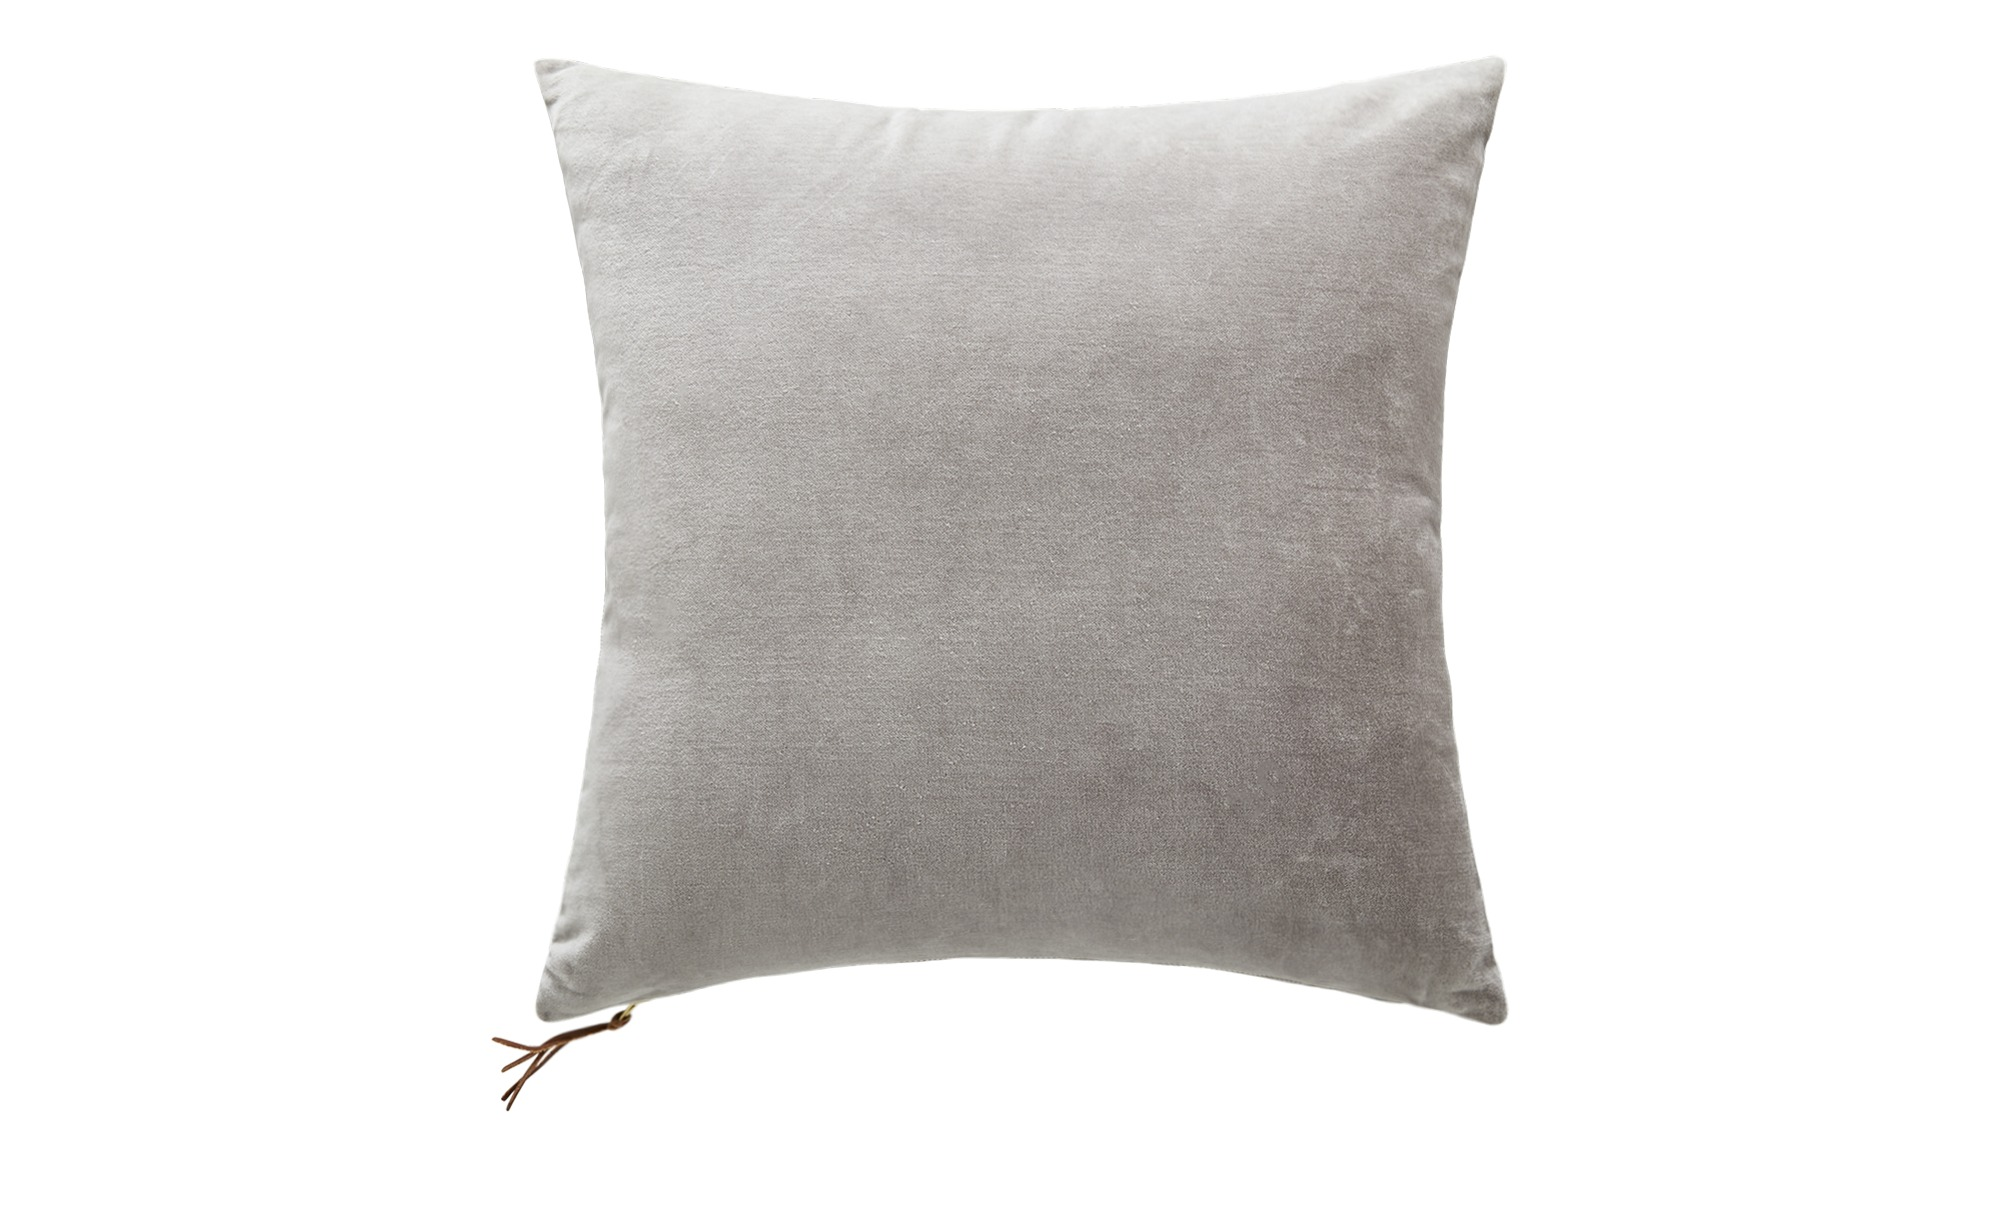 Kissenhülle Kissenbezug Dekokissen 100/% Baumwolle 15 Maße Zickzack